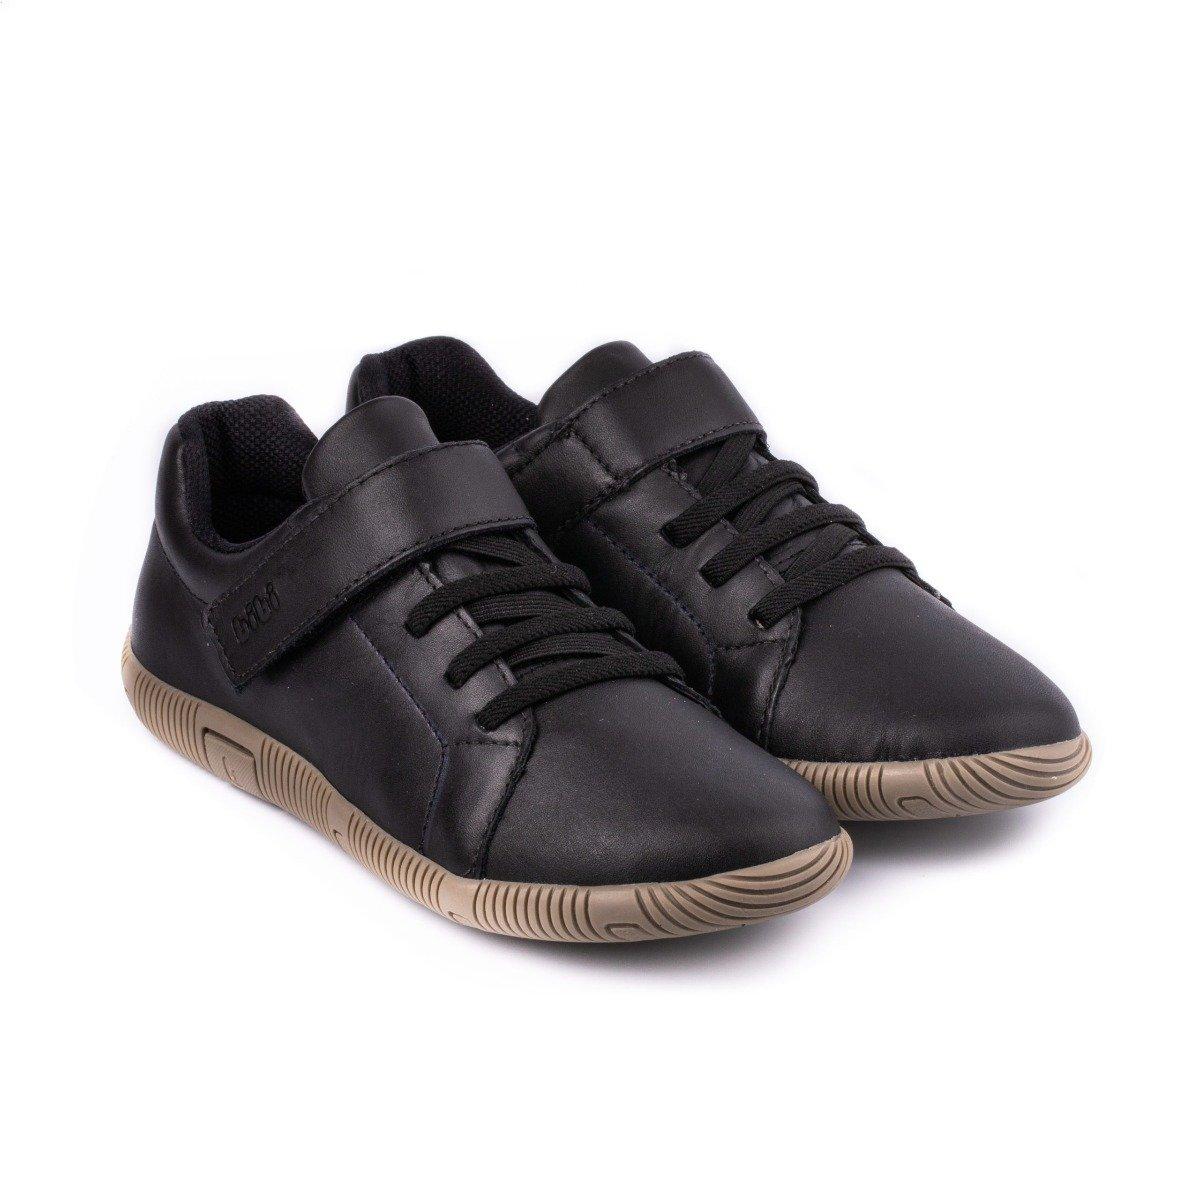 Pantofi Bibi Walk New Black